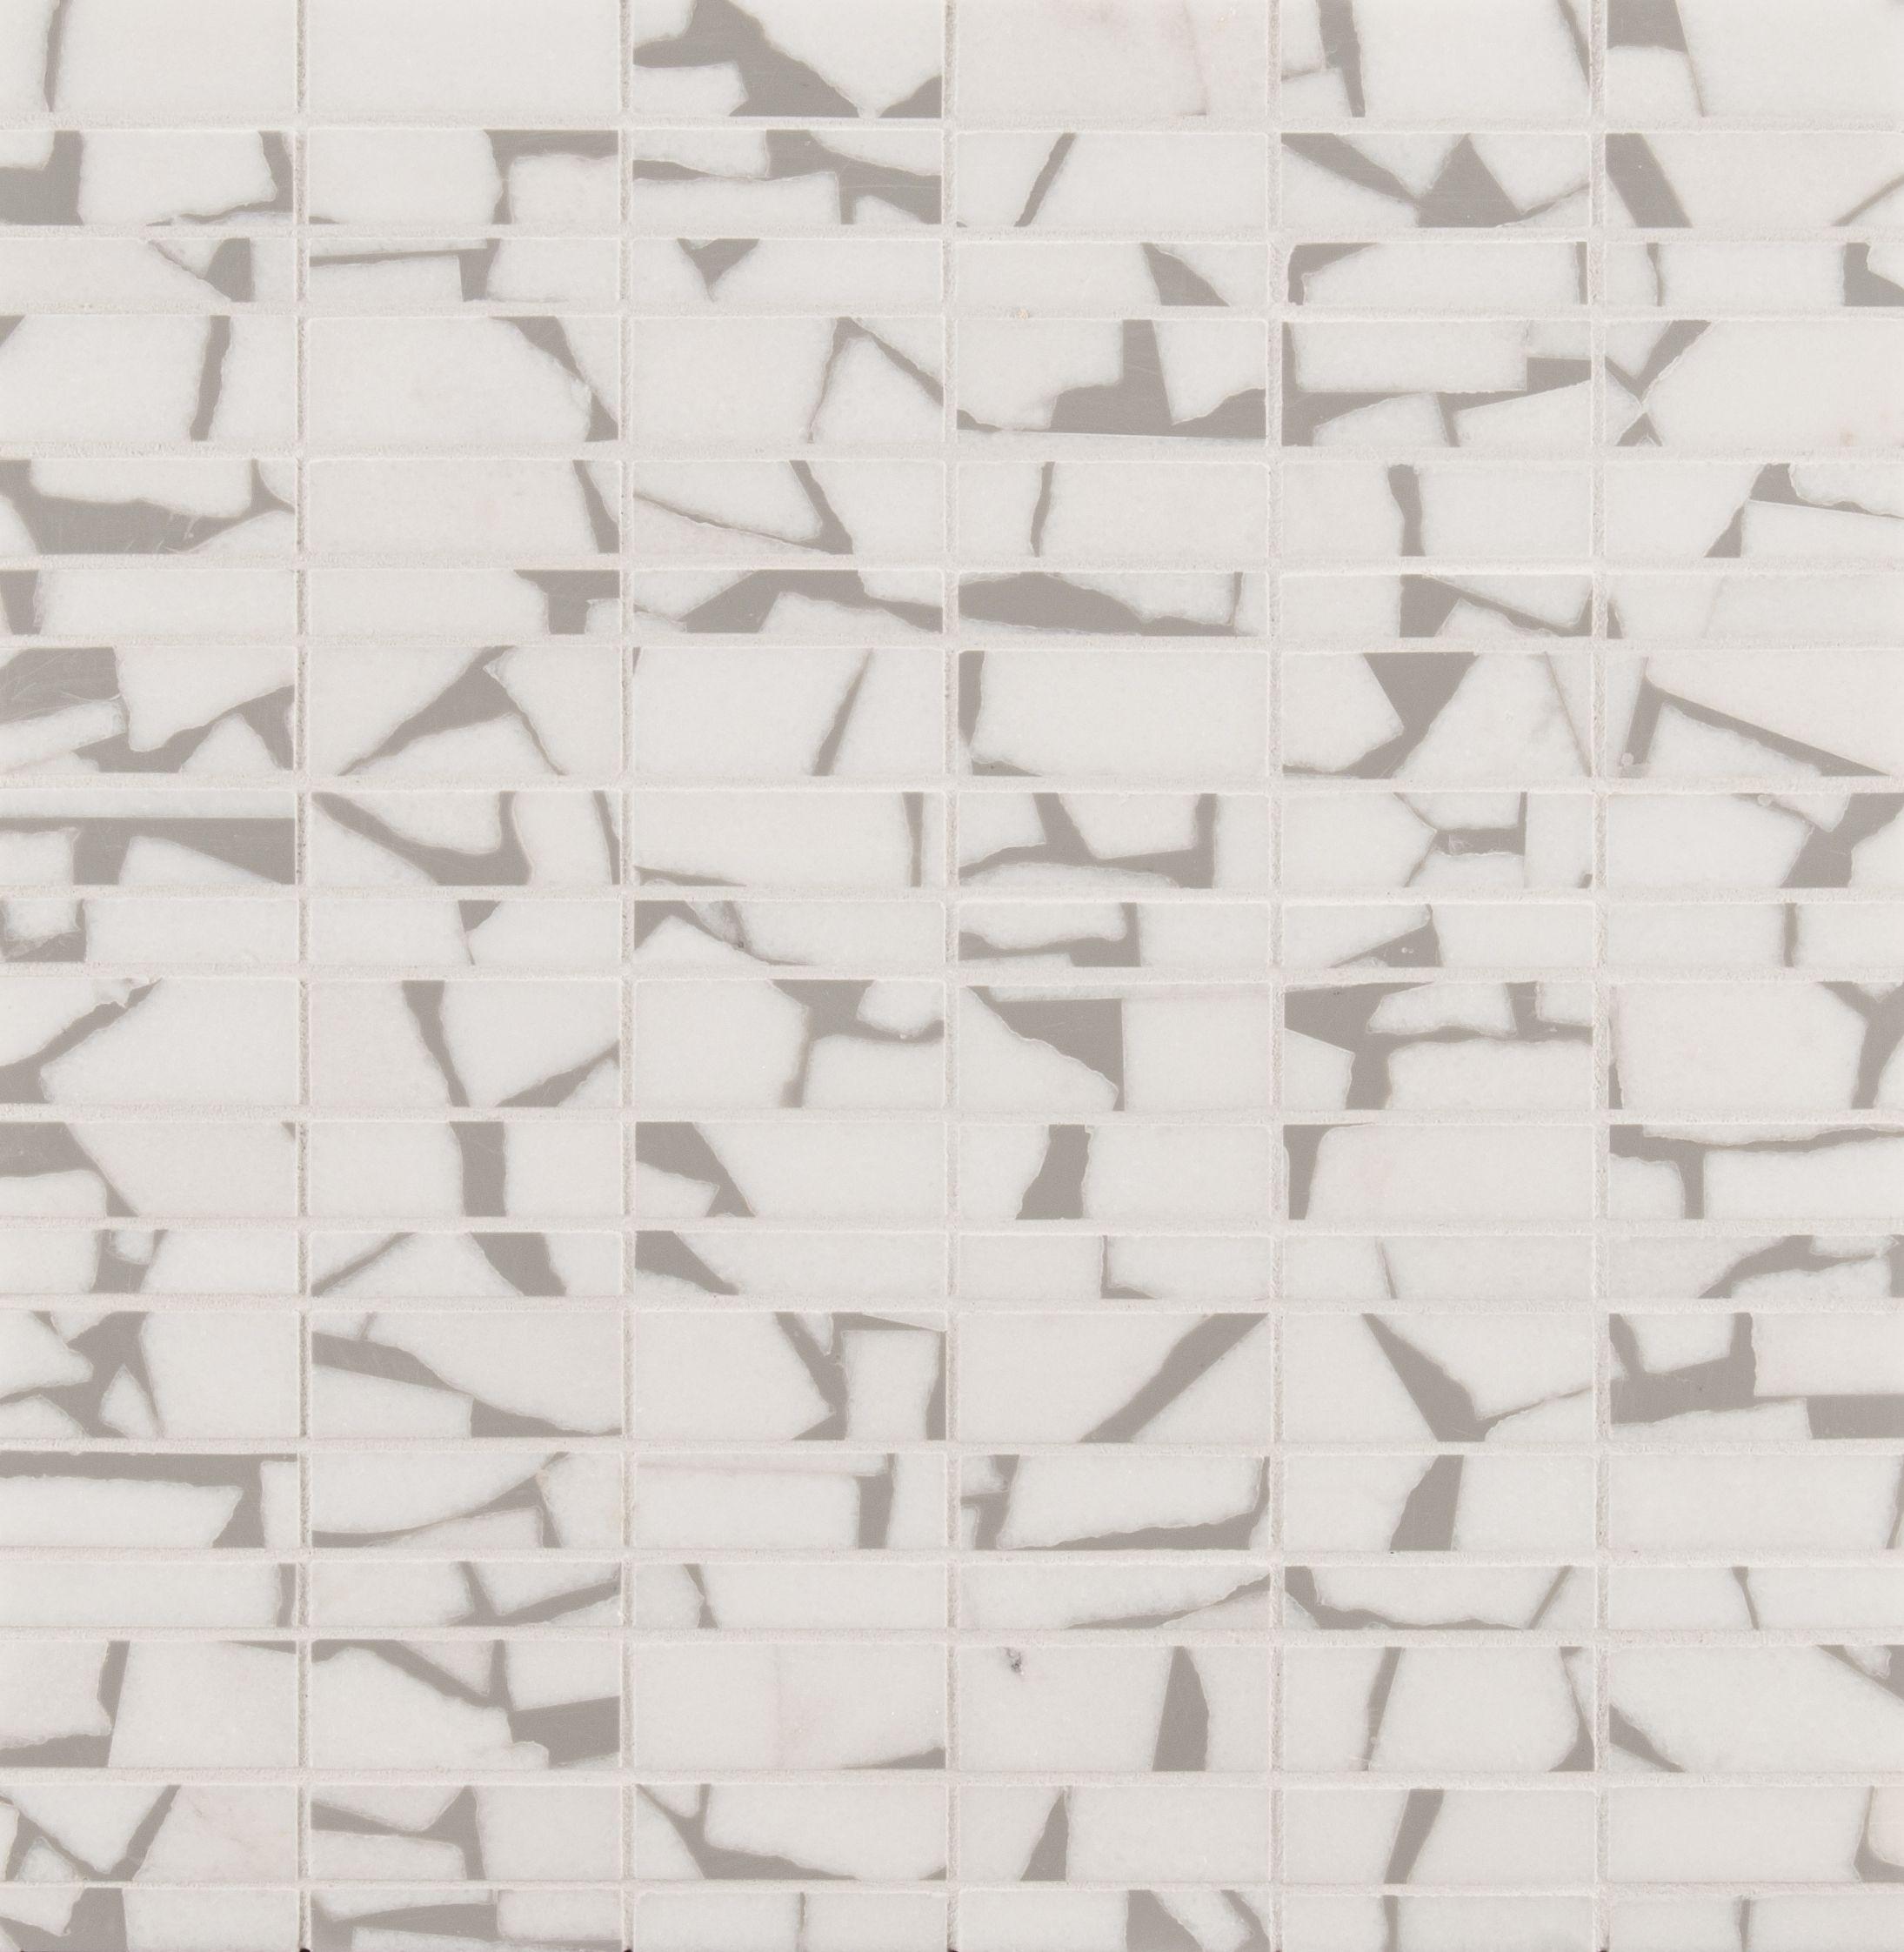 Ann Sacks Selvaggio Thassos Marble Mosaic In Dusty Grey